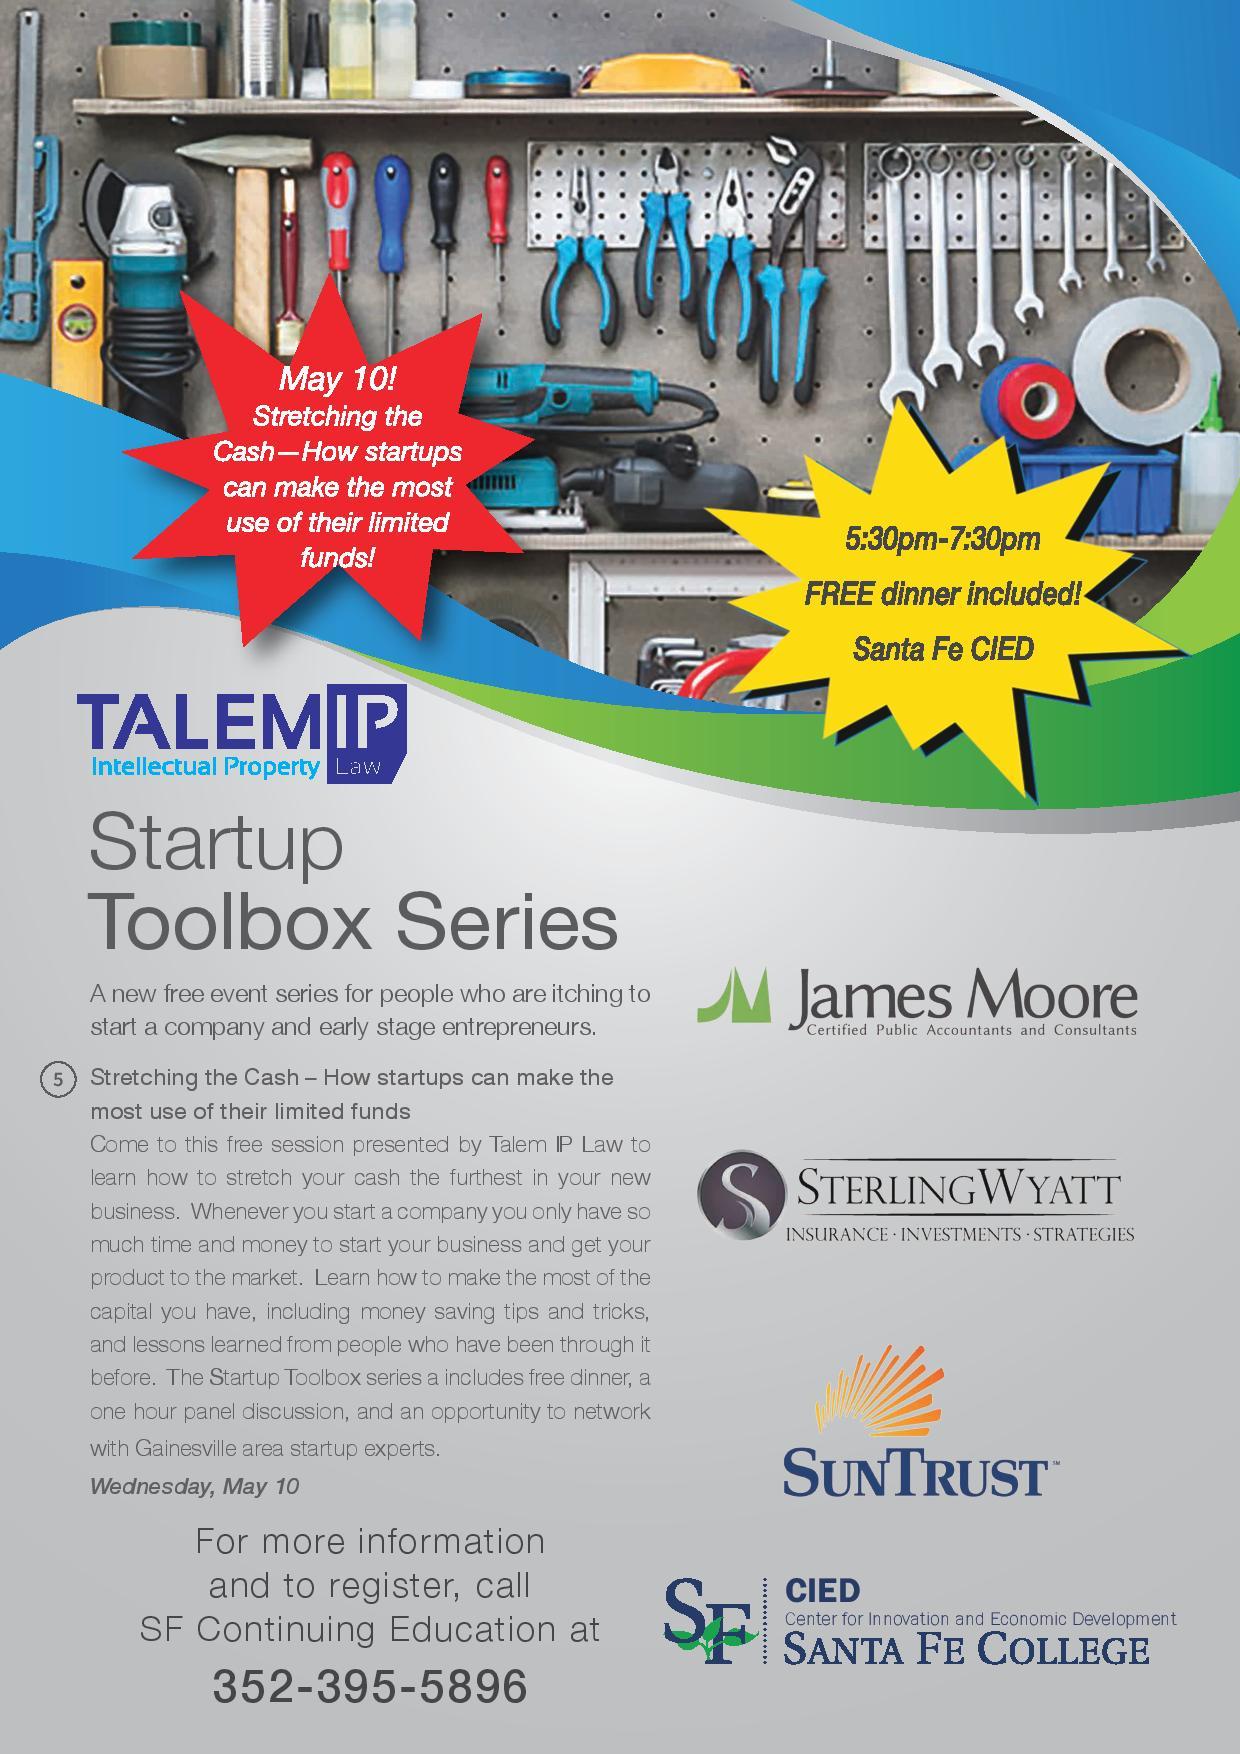 Startup Toolbox Series!